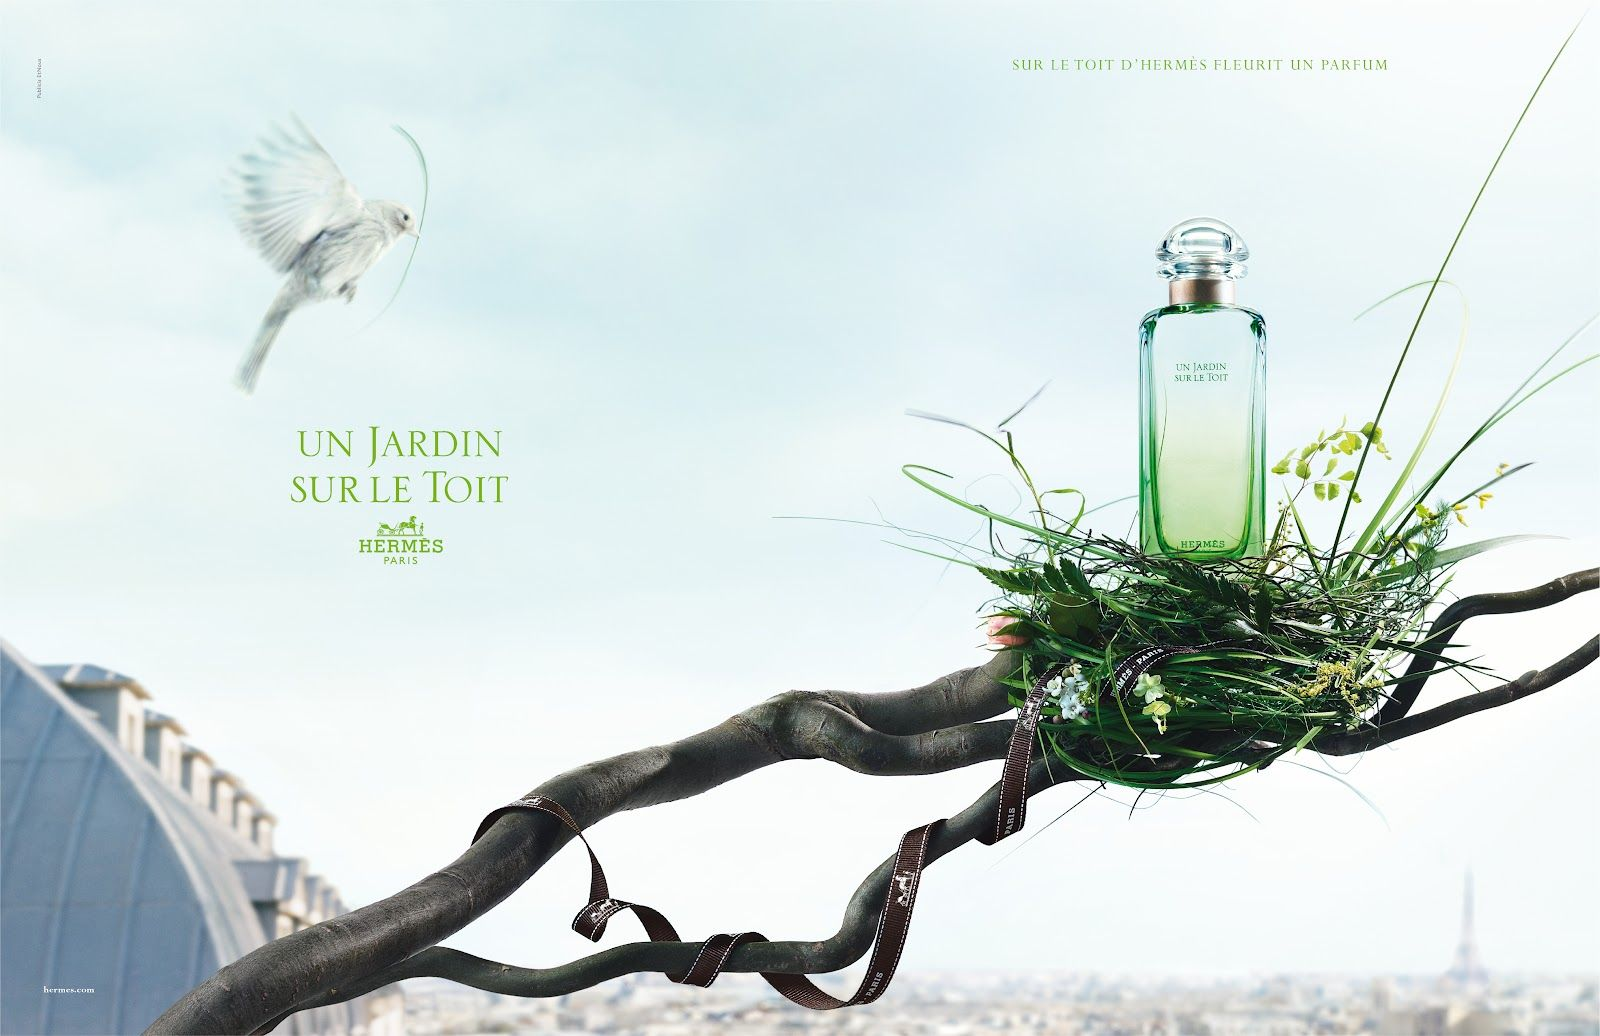 Hermes Fragrance Un Jardin Sur Le Toit Fragrance Perfume Ad